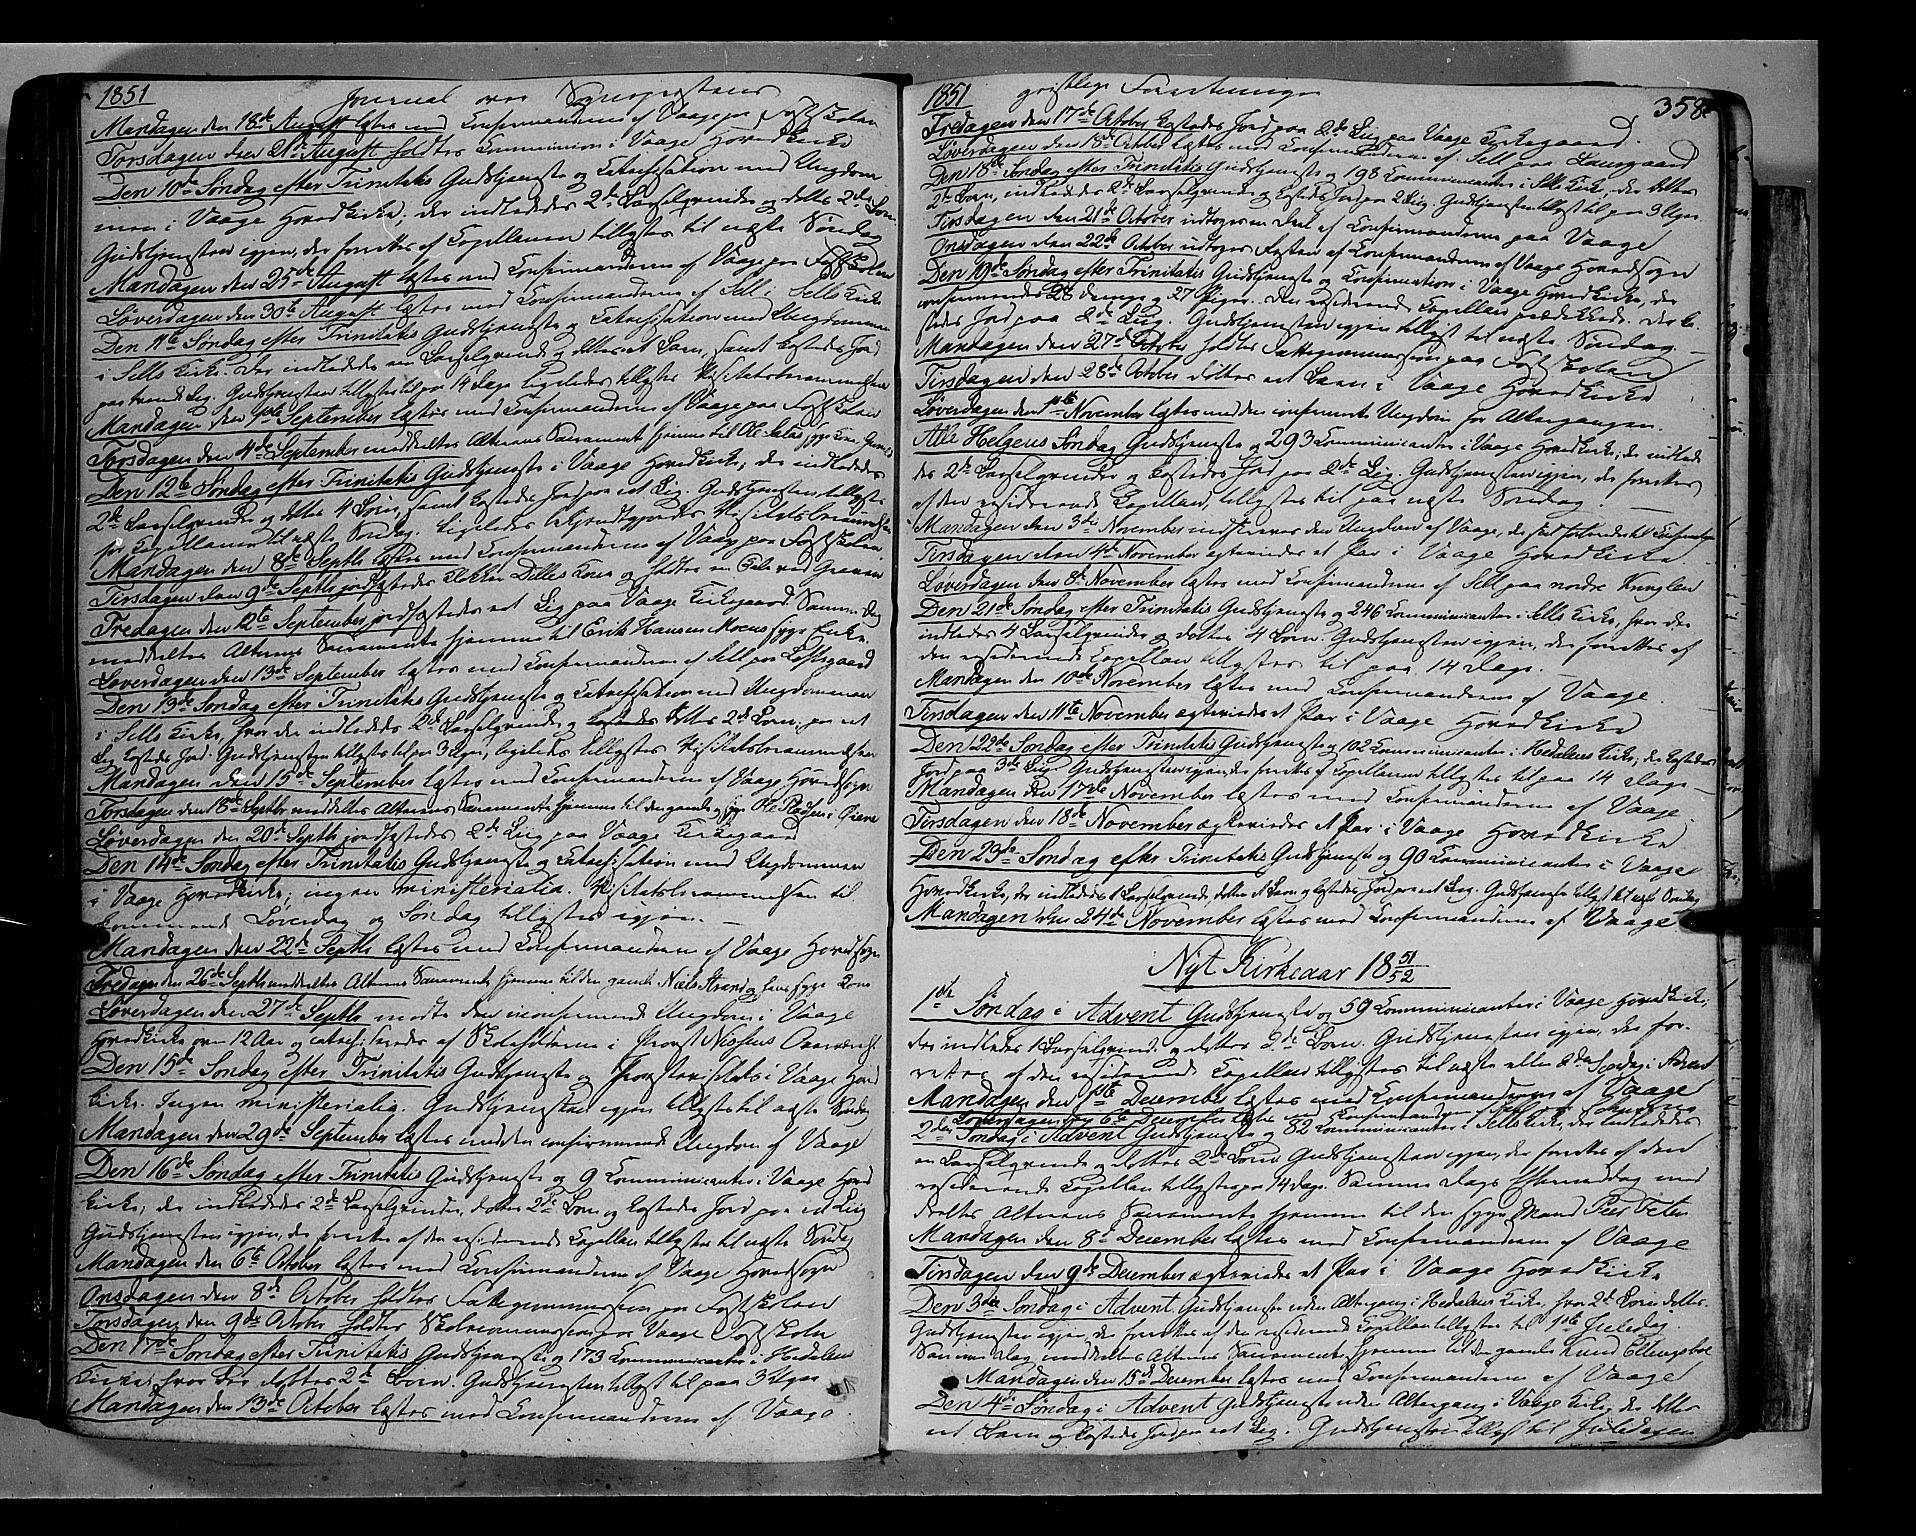 SAH, Vågå prestekontor, Ministerialbok nr. 5 /1, 1842-1856, s. 358